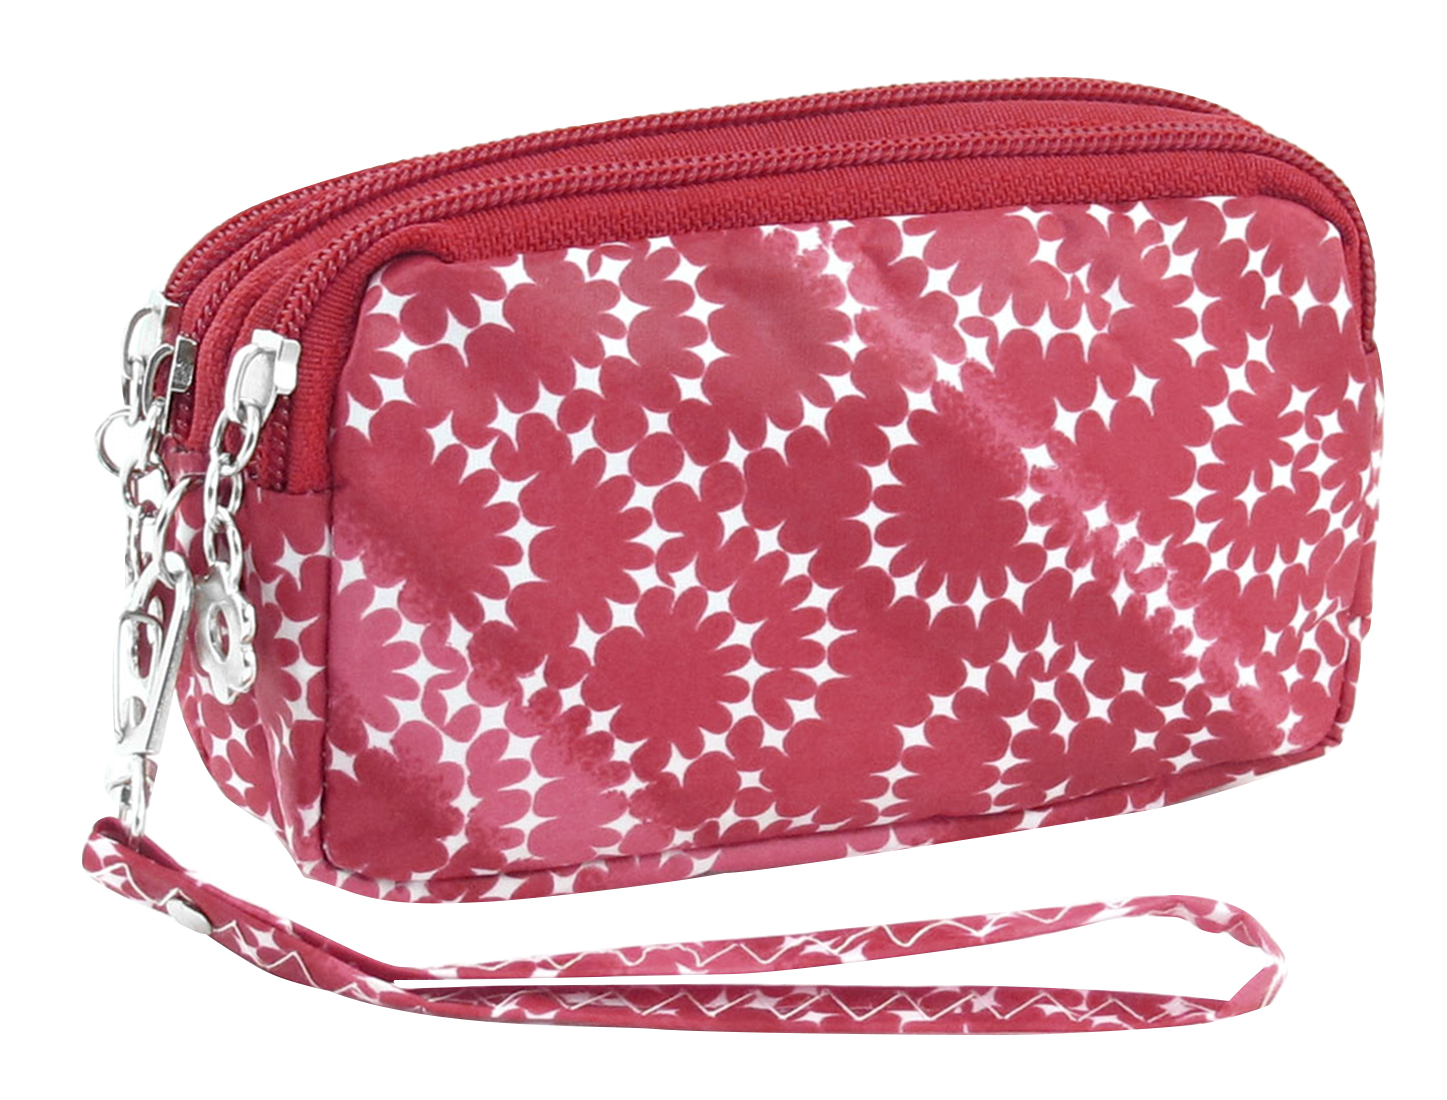 Nylon Lining 3 Zip Pockets Cash Keys Wristlet Purse Wallet Red White for Women